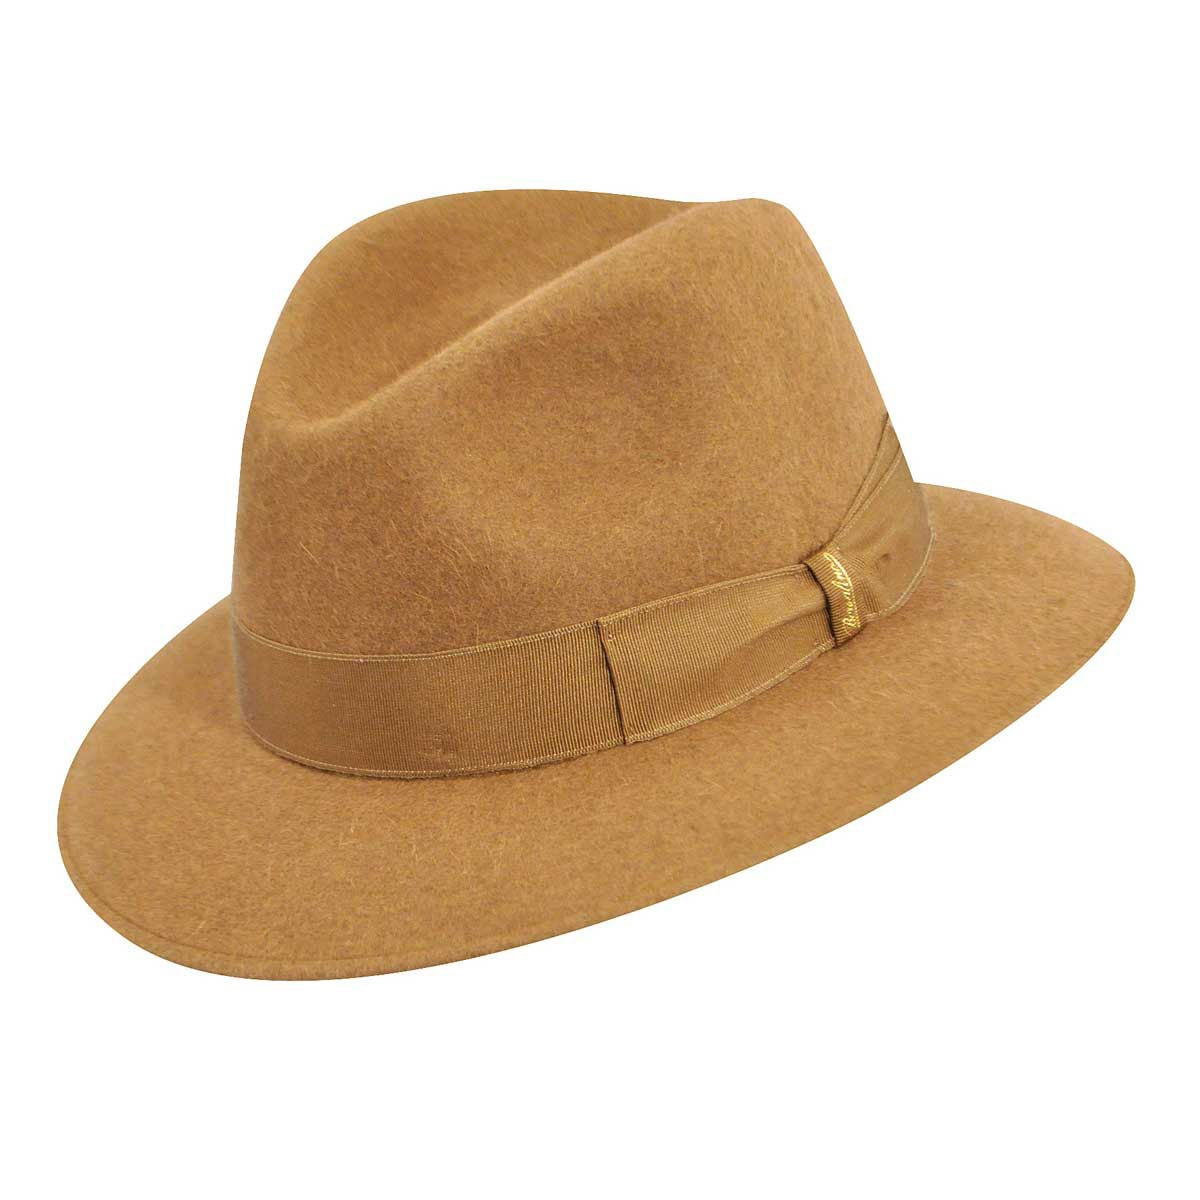 32ee863b2be Borsalino Mens 150253 Traveler Fur Felt Fedora Hat 7 1 4 Light Brown ...